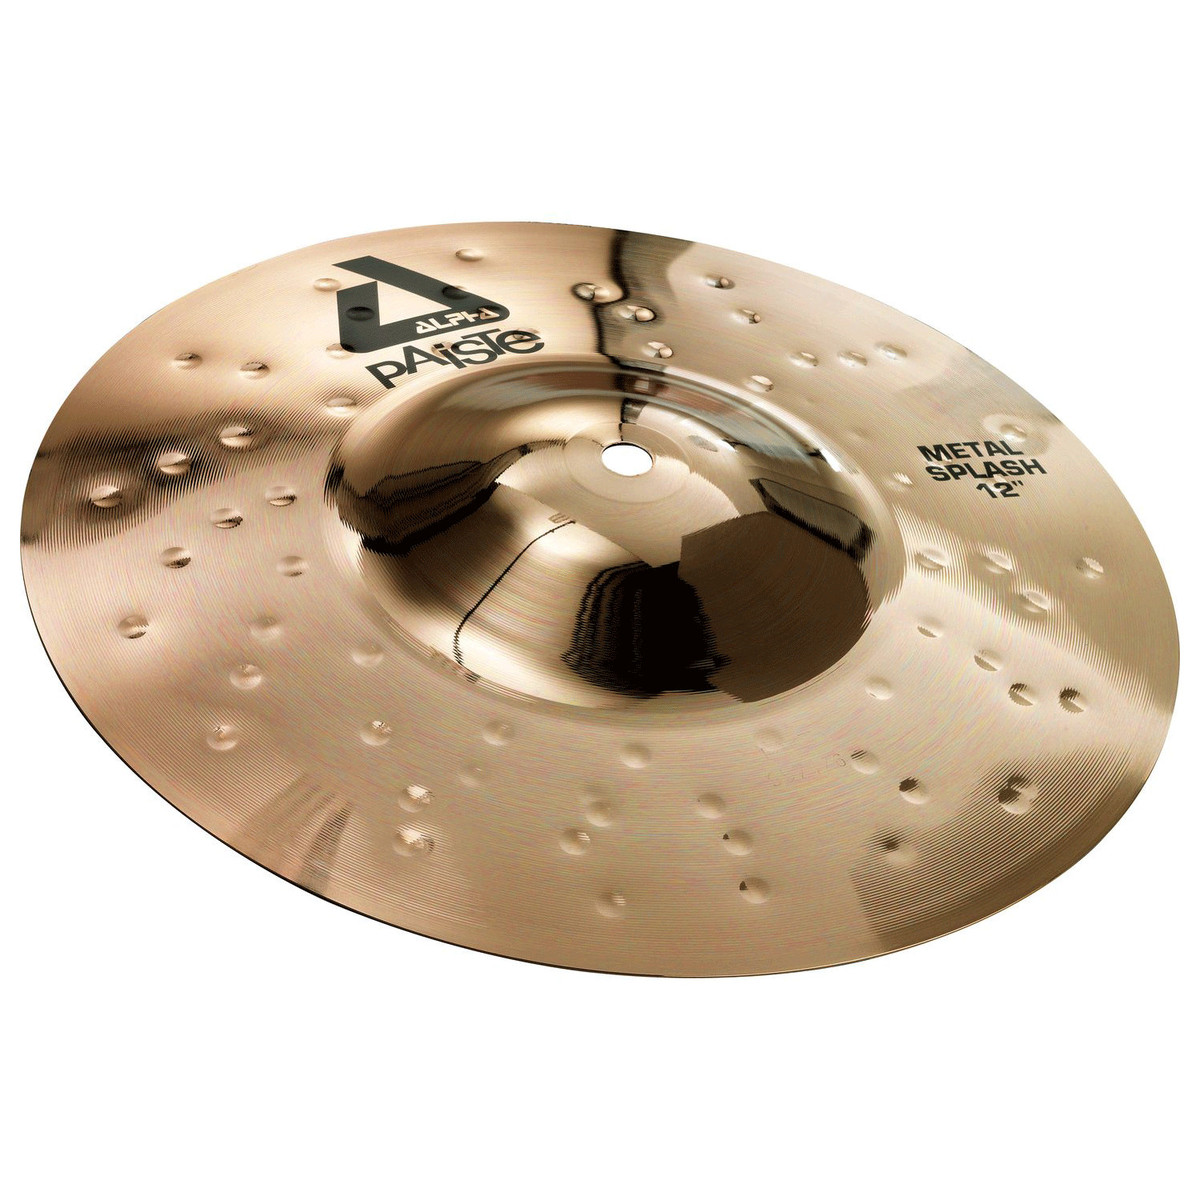 paiste alpha 12 39 39 metal splash cymbal brilliant finish at gear4music. Black Bedroom Furniture Sets. Home Design Ideas